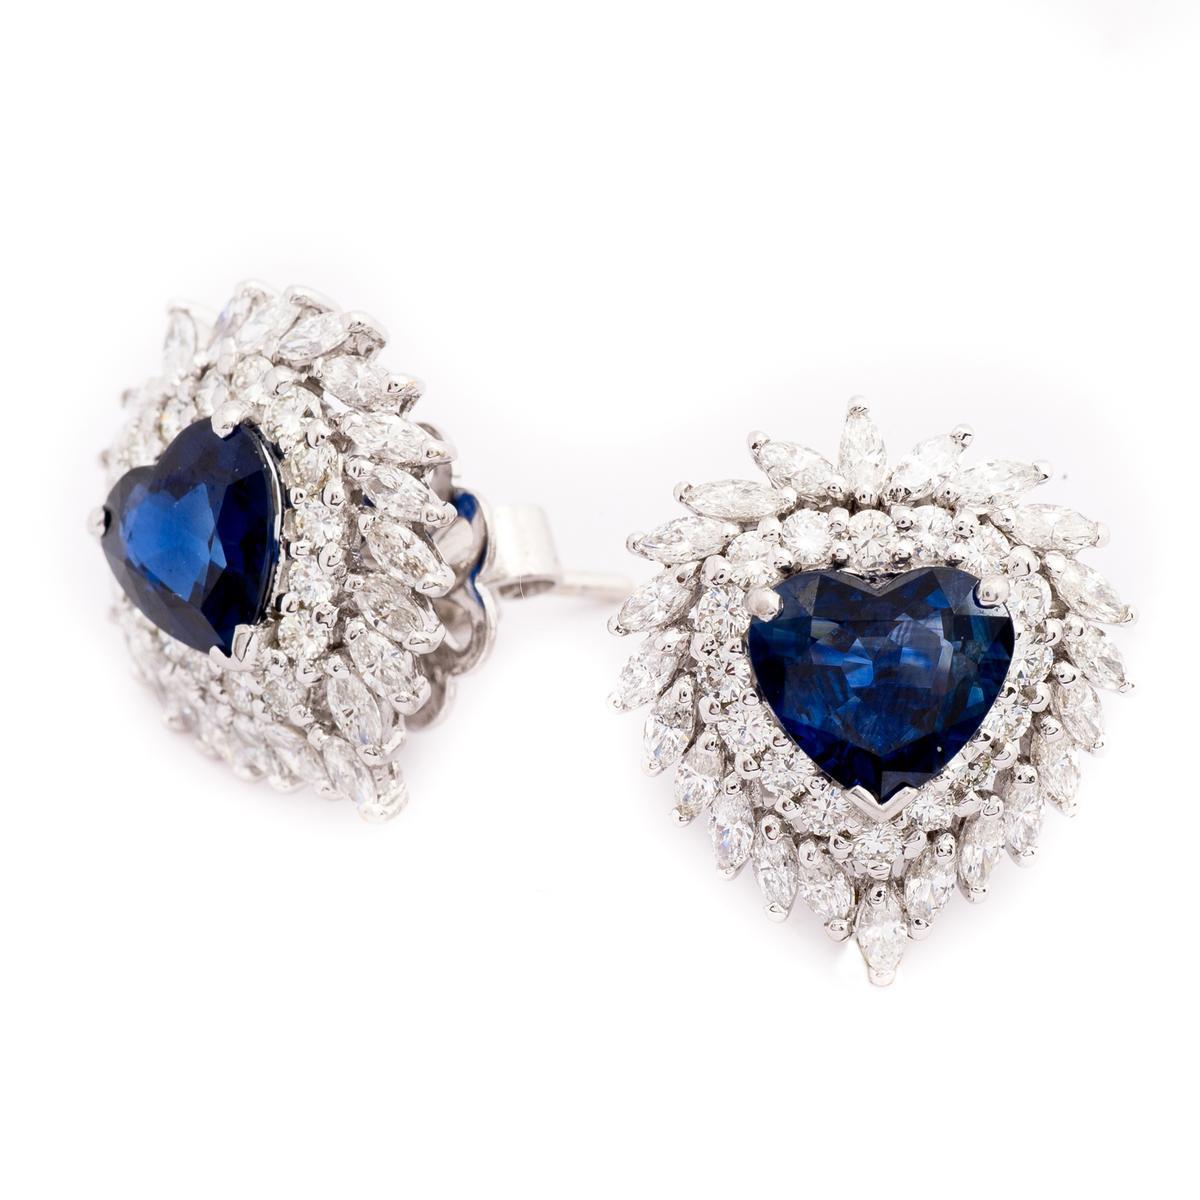 Vintage 8.95 CTW Heart Shaped Sapphire & Diamond Earrings